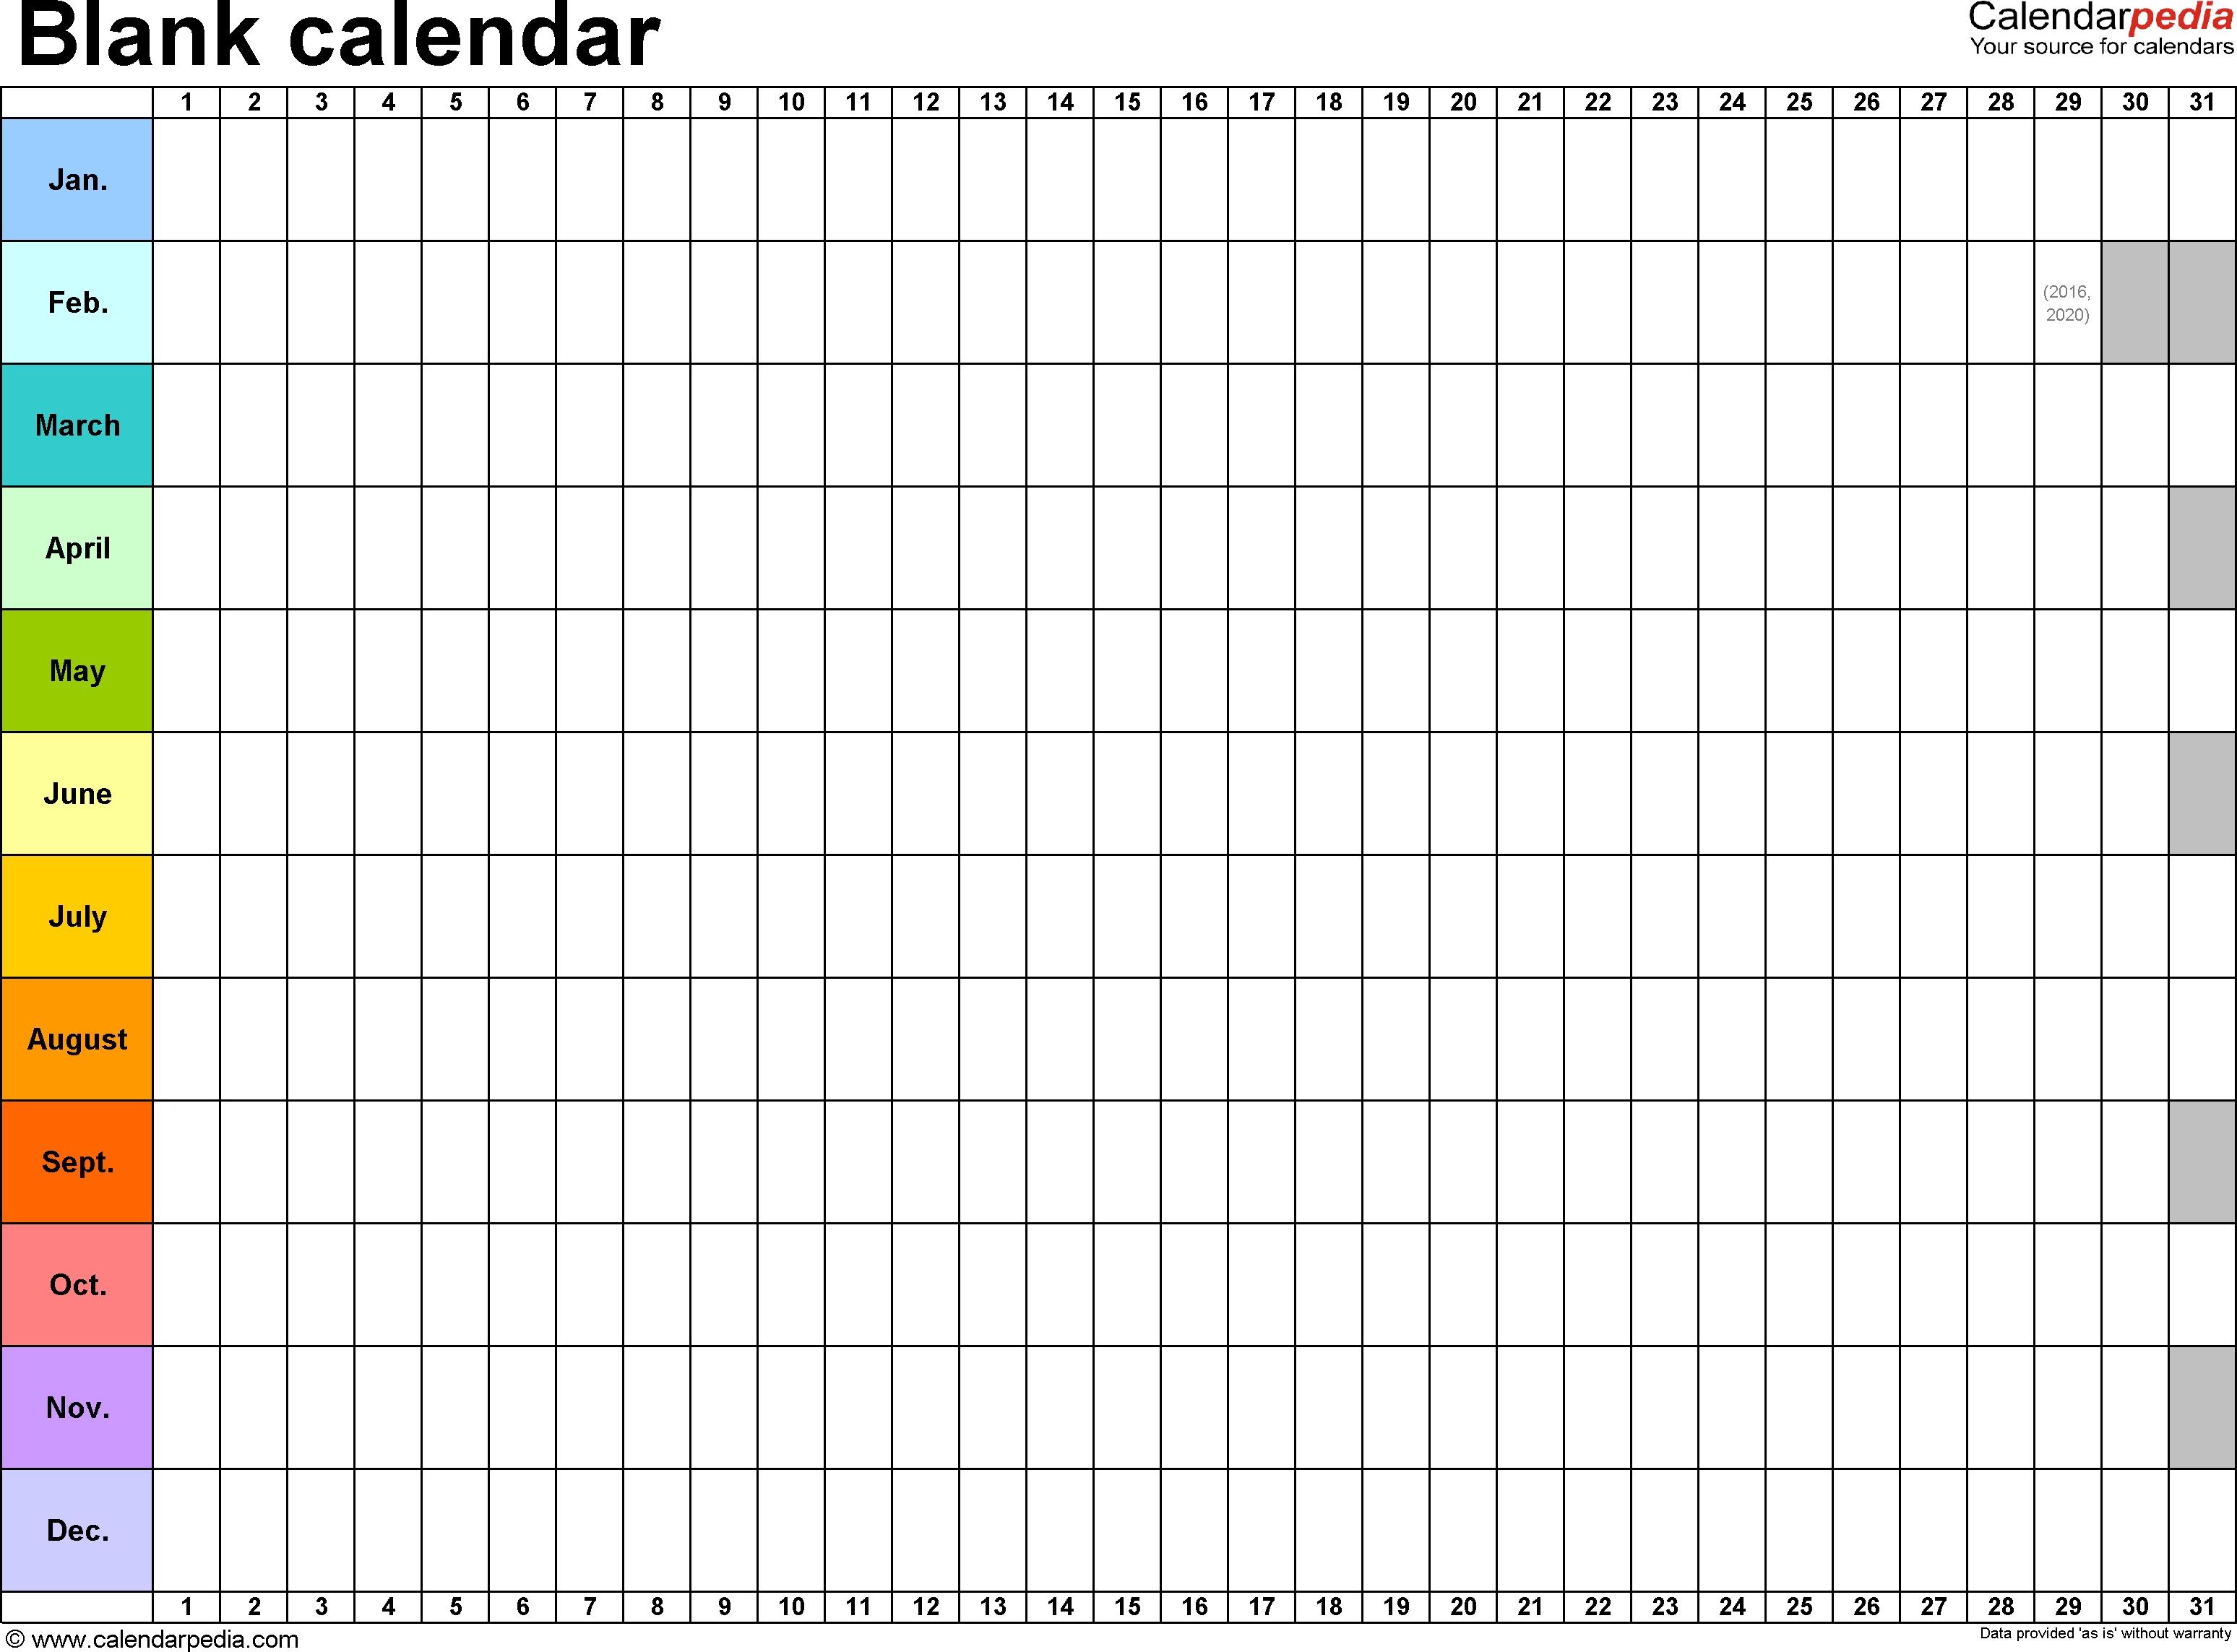 Blank Calendar - 9 Free Printable Microsoft Word Templates Blank Calendar By Month